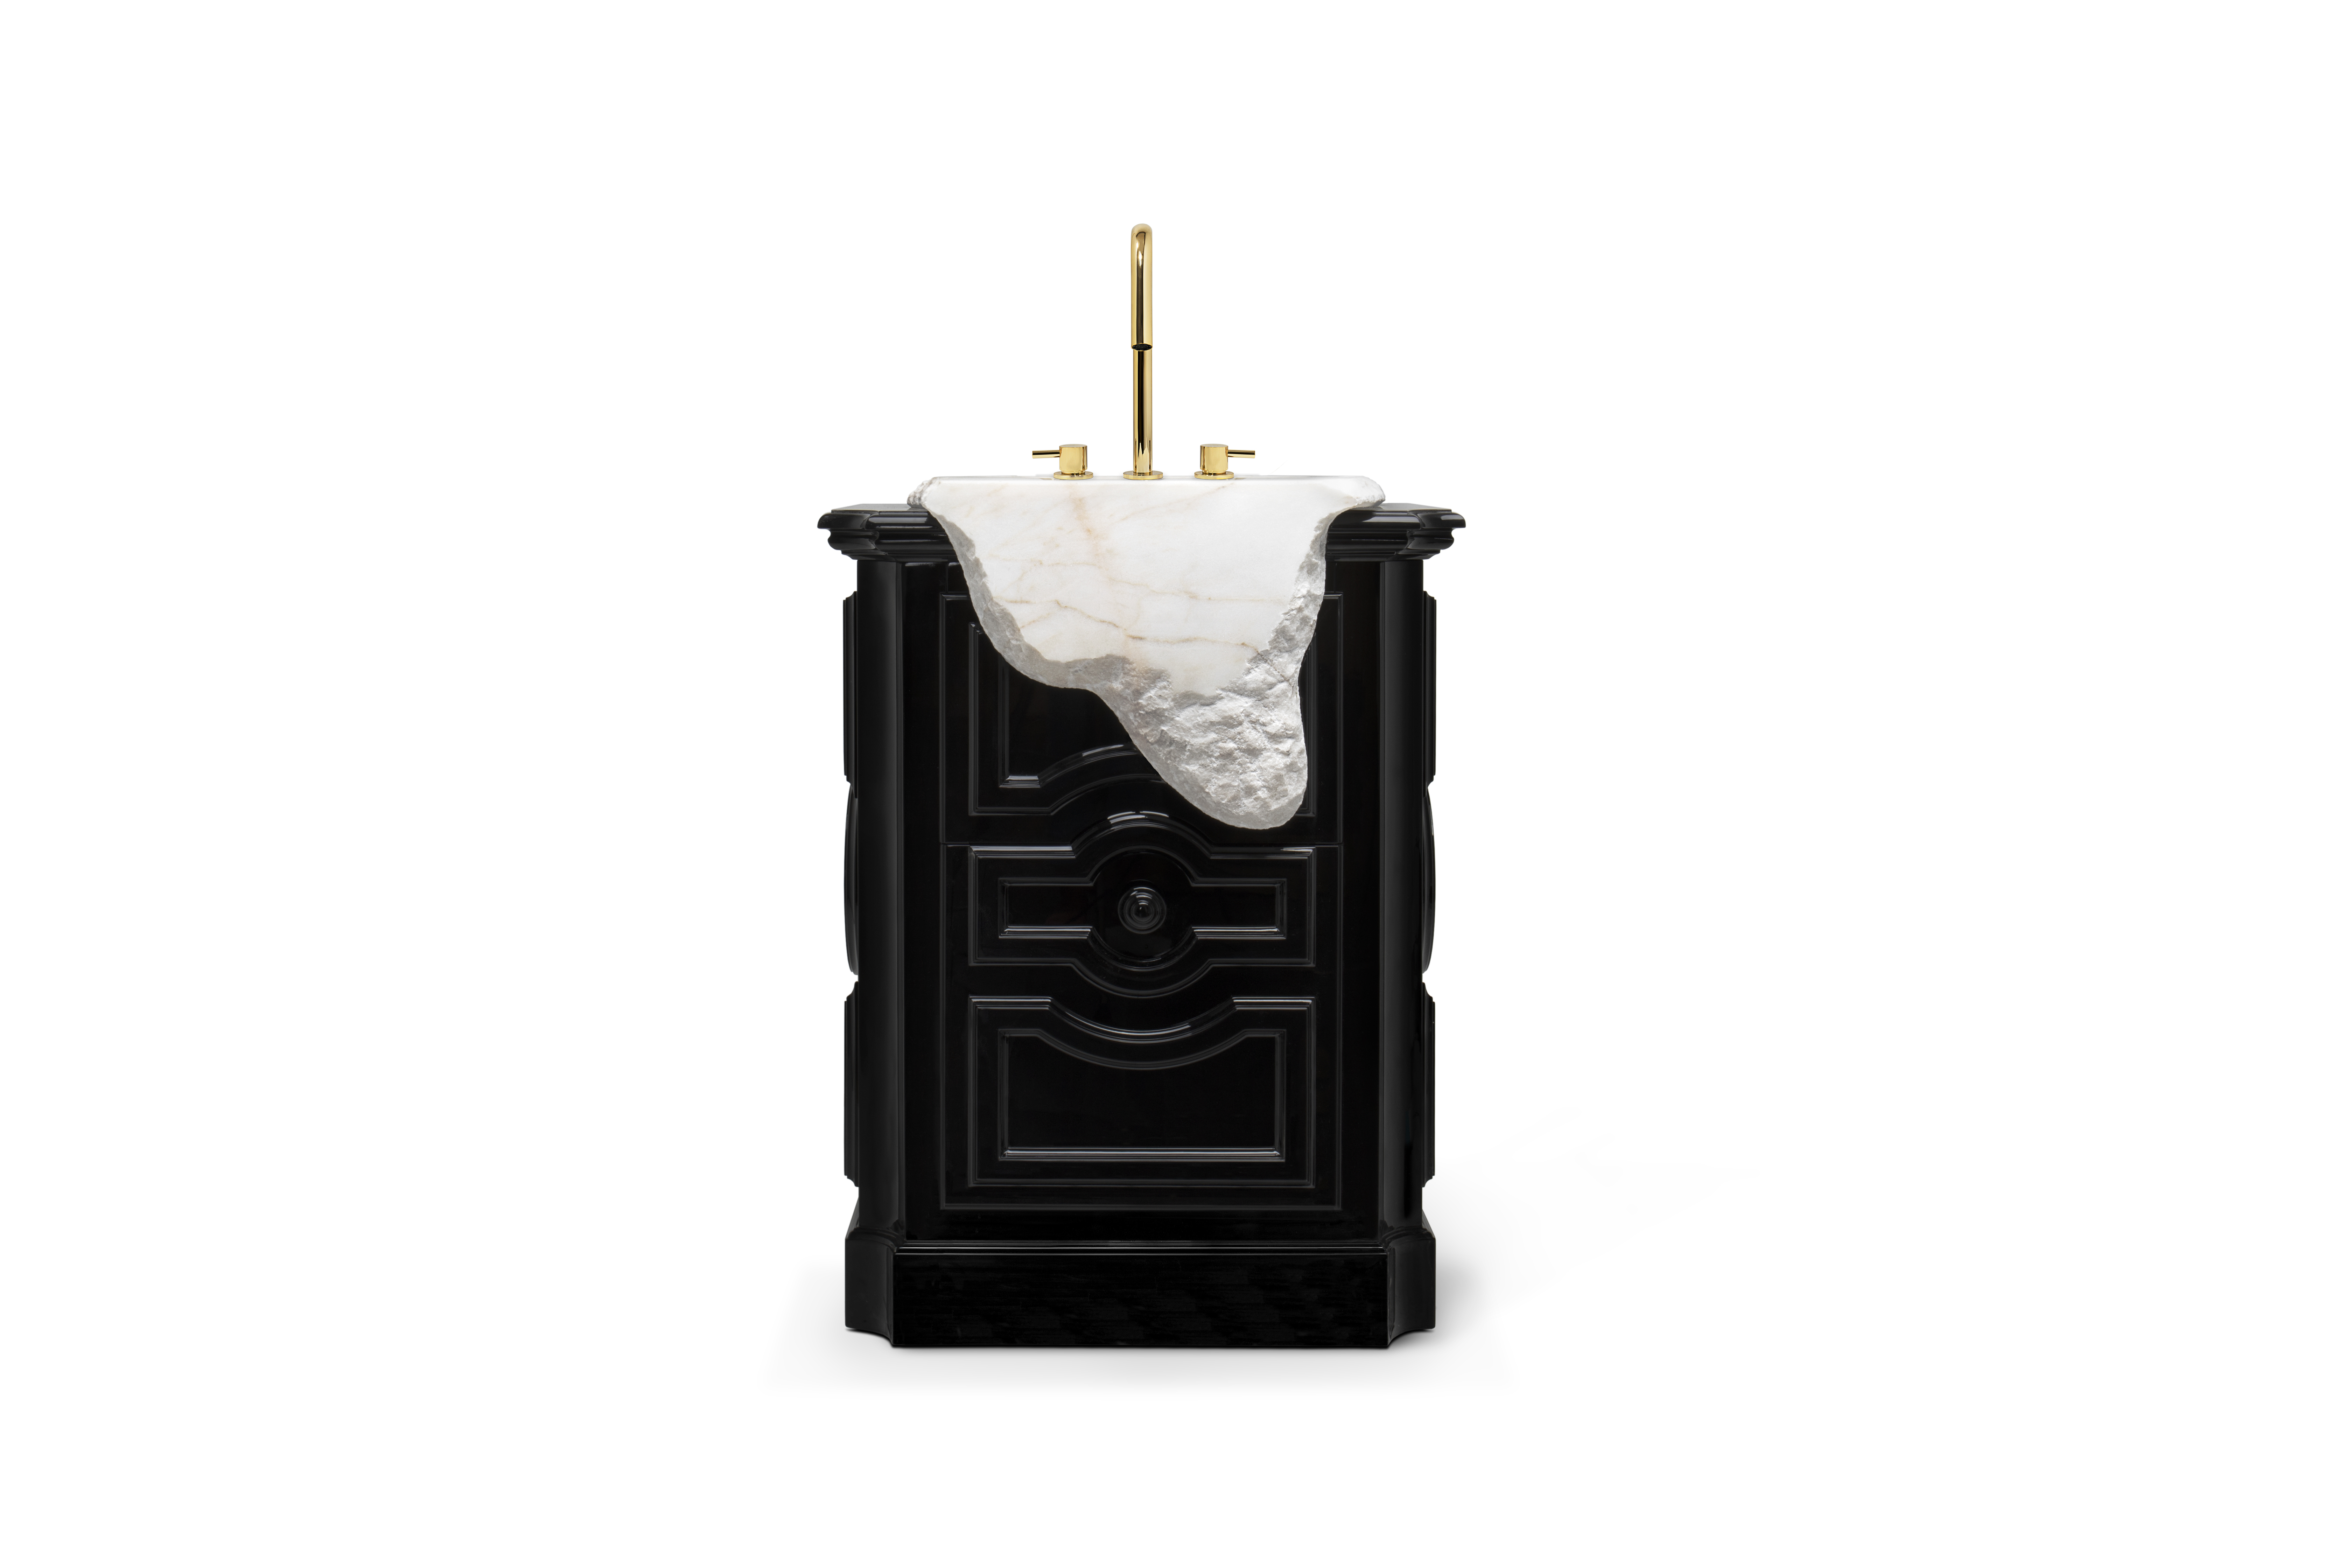 Transform Your Bathroom, bathroom, bathroom renovation, relax, maison valentina, bathtub, freestanding, suspension cabinet  Elegant and Functional Tips to Transform Your Bathroom into a Relaxing Place petra freestand 1 HR